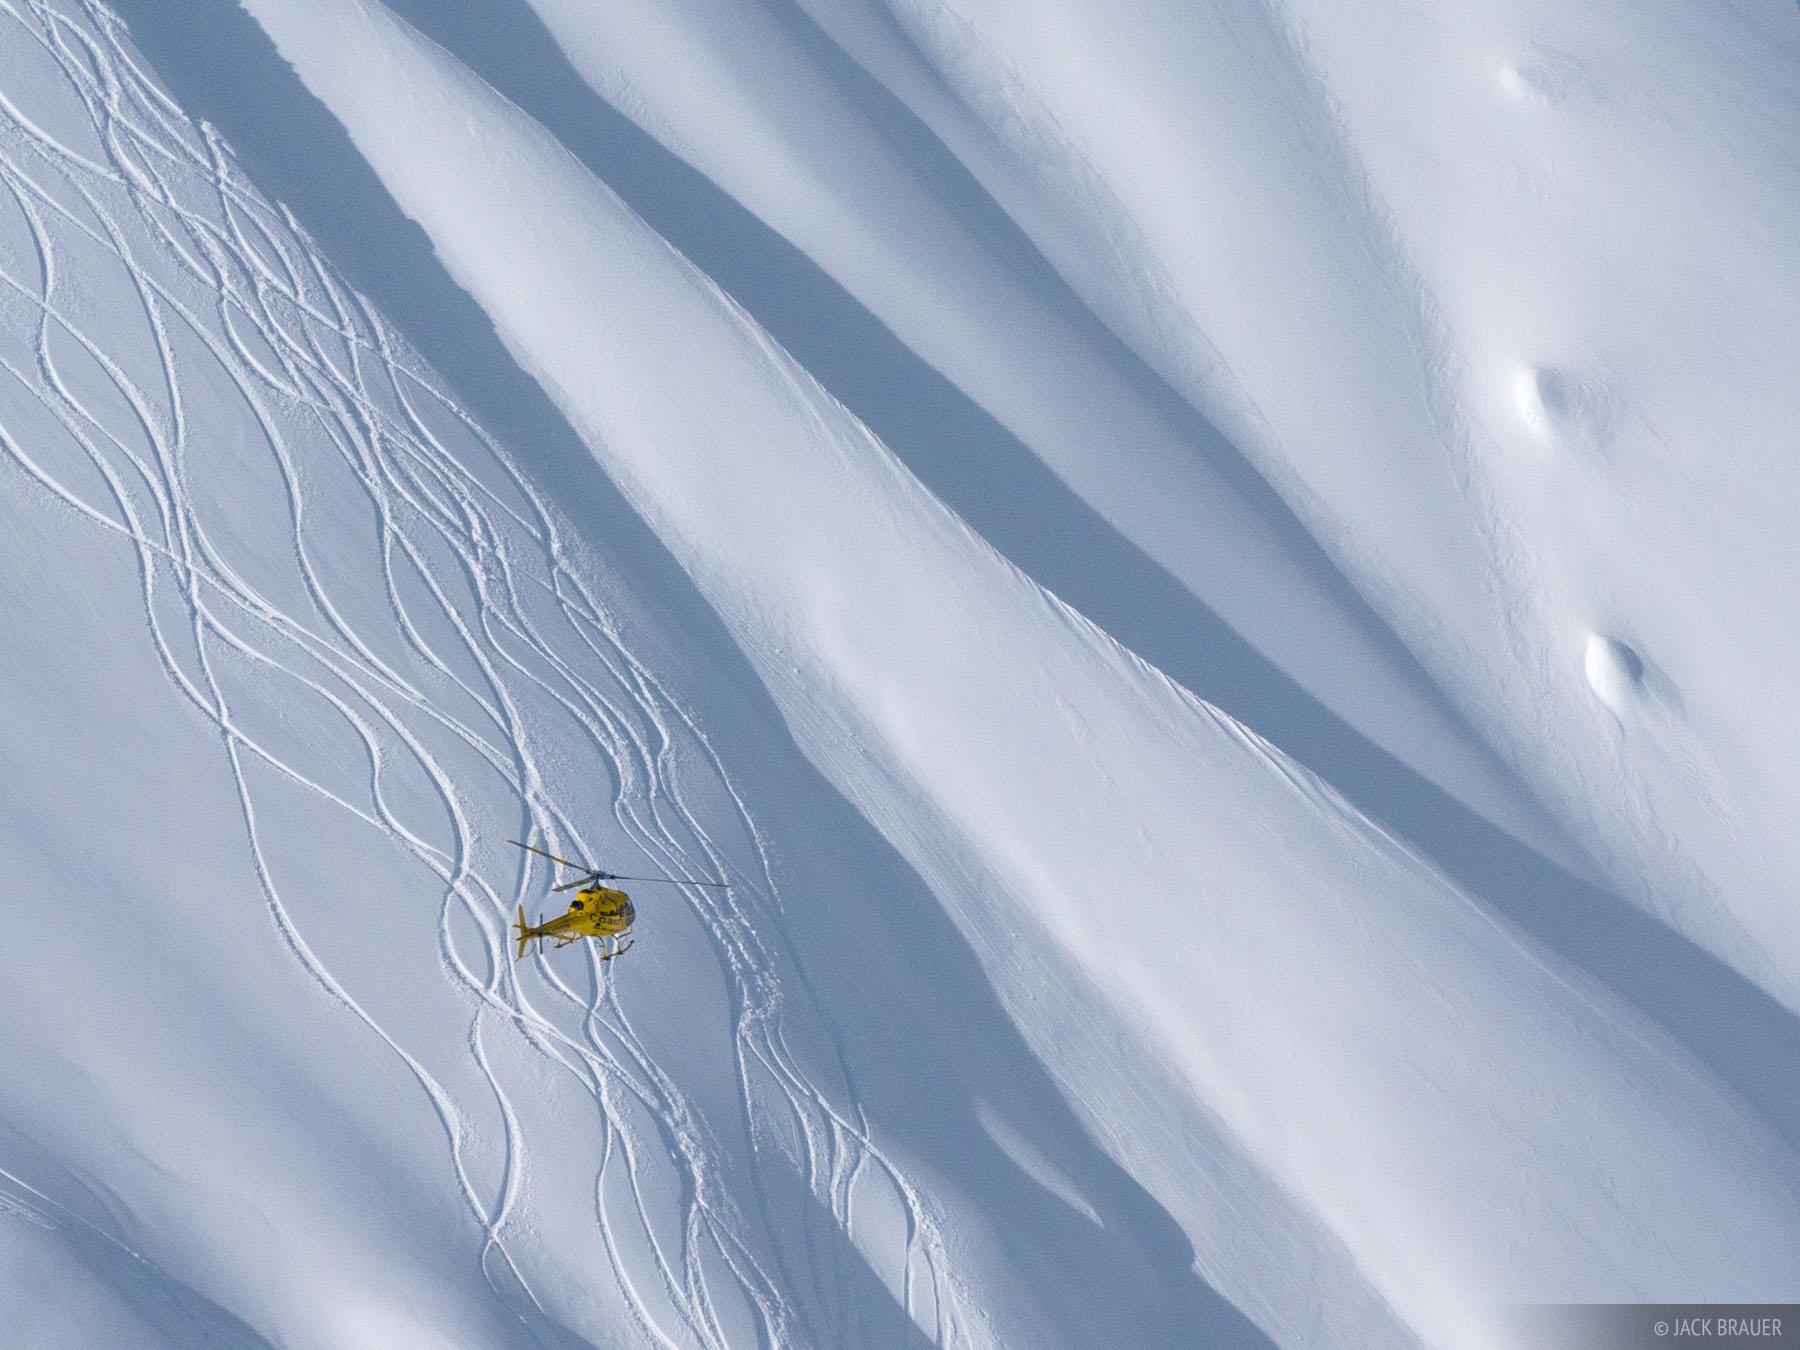 Alaska, Haines, helicopter, Takhinsha Mountains, skiing, March, Takhinsha, winter, active, 2016